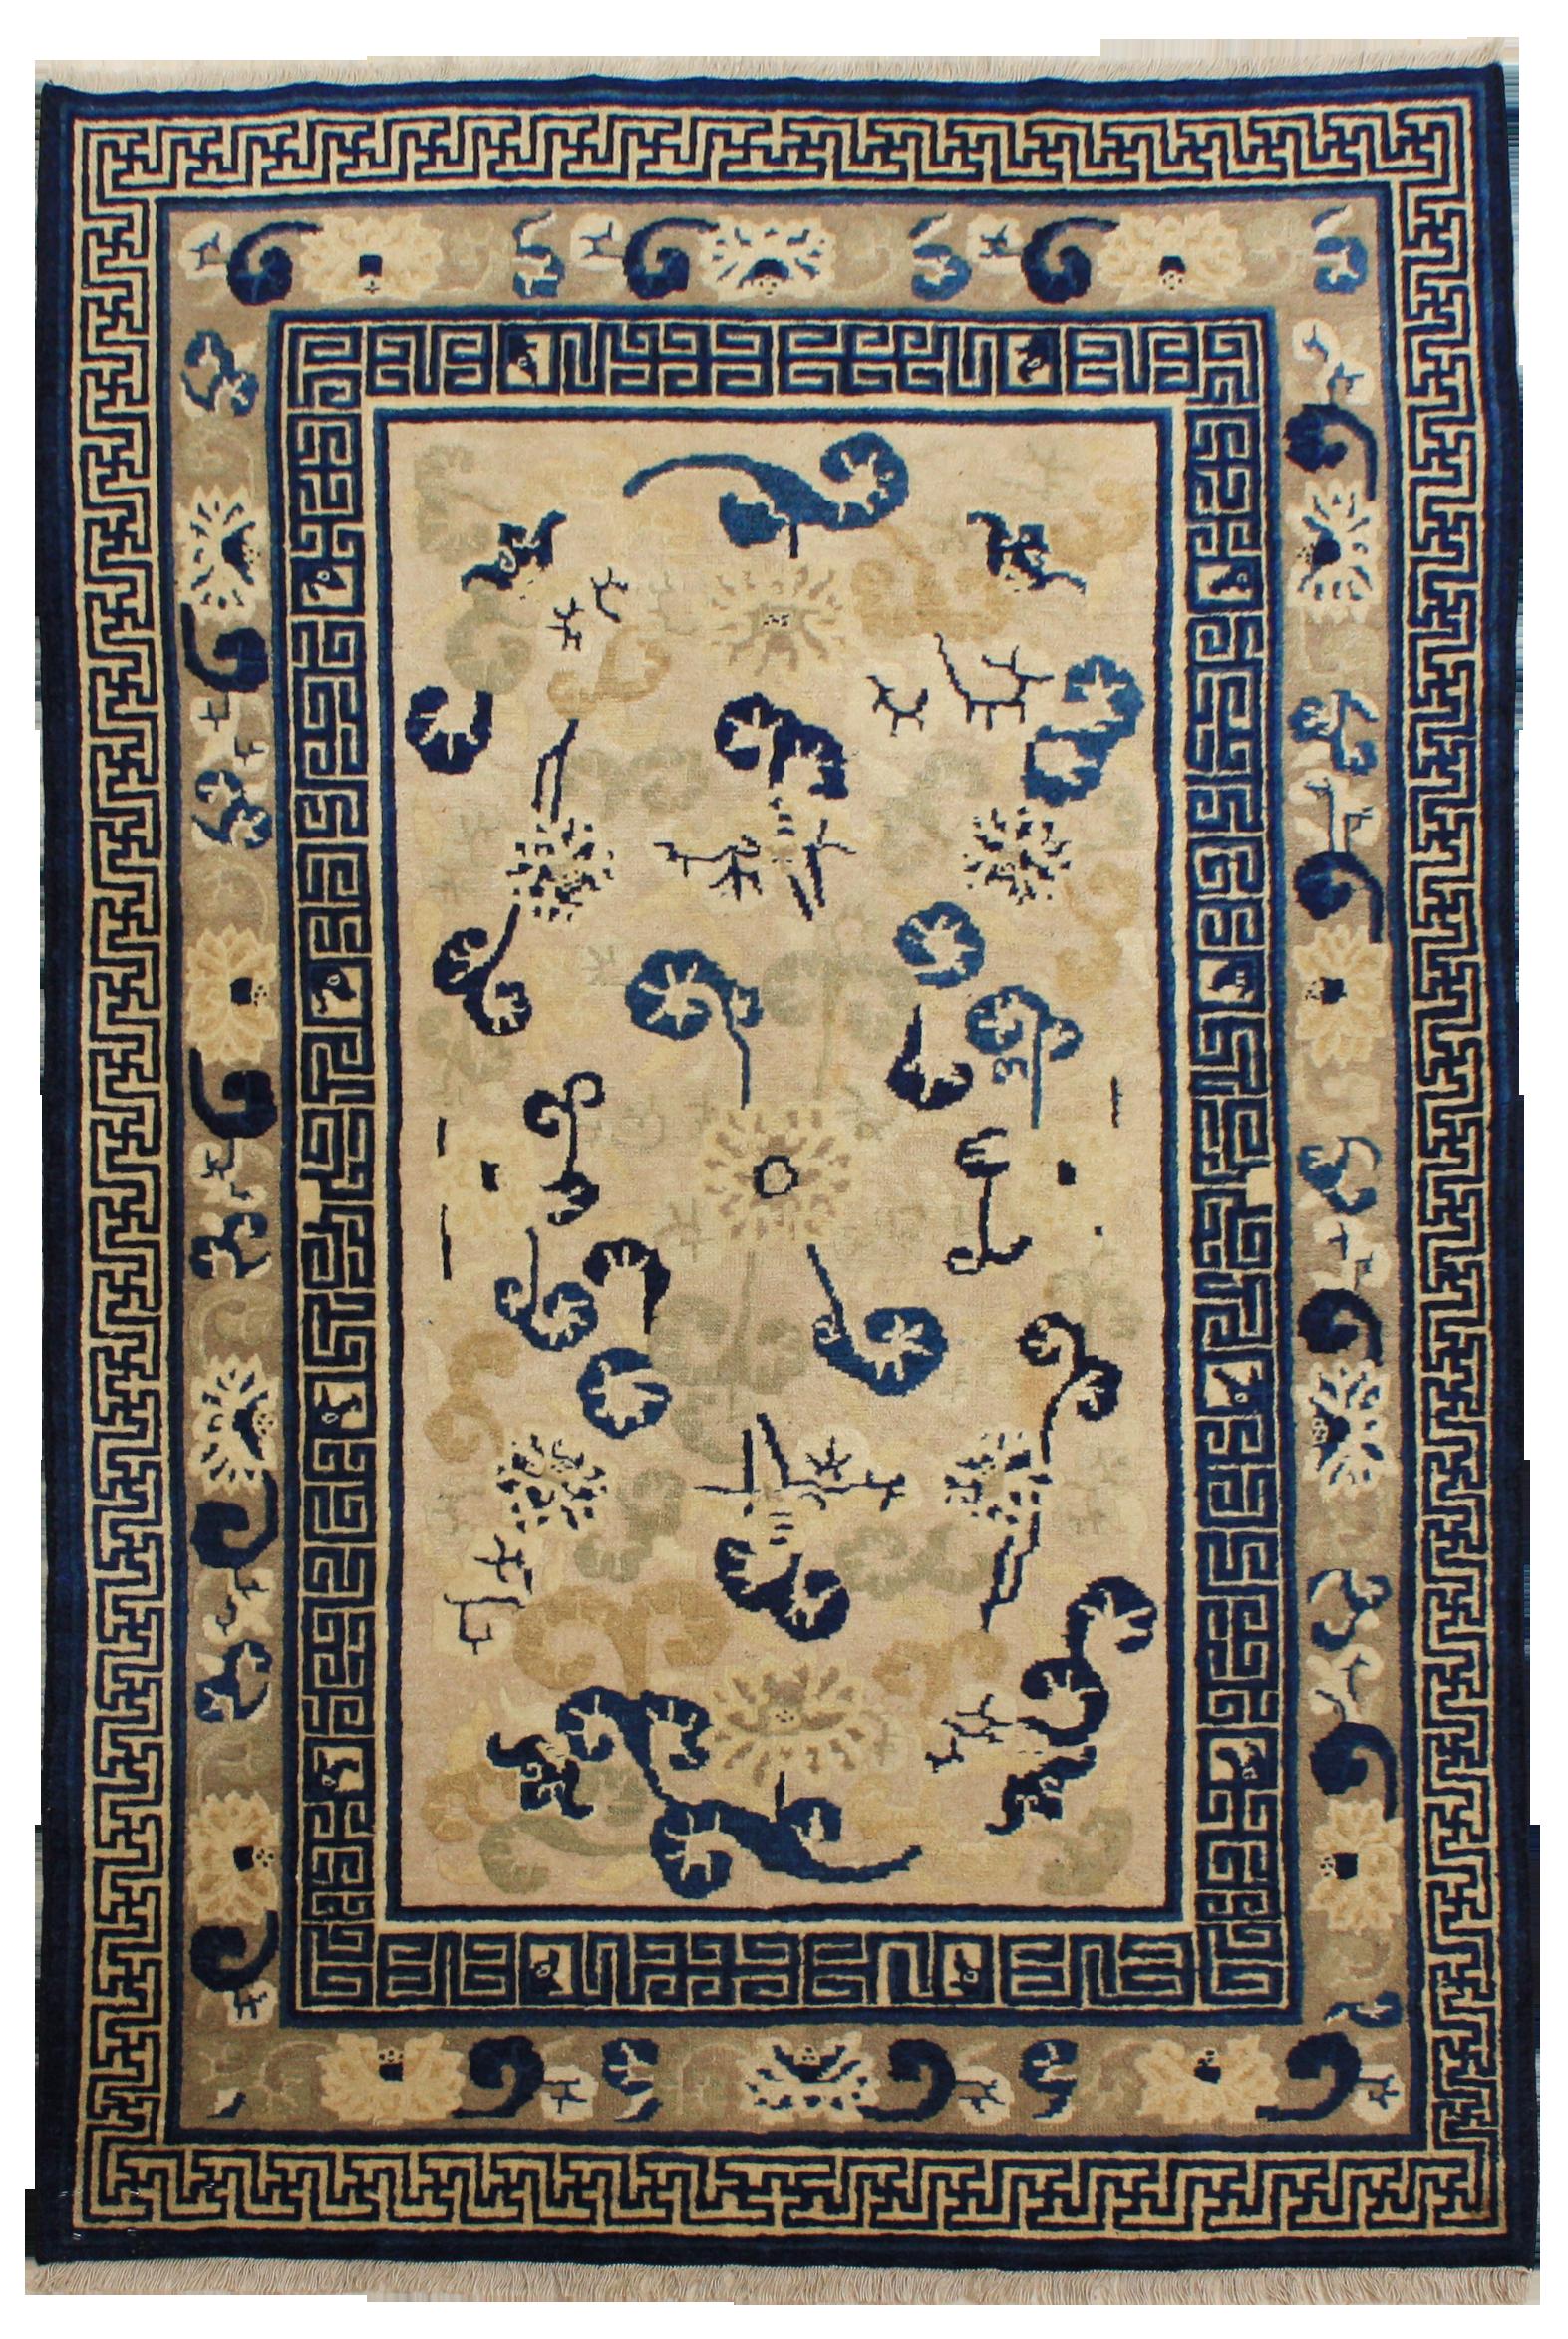 Cod. 905 Pechino Antico 168x115, tappeto cinese antique